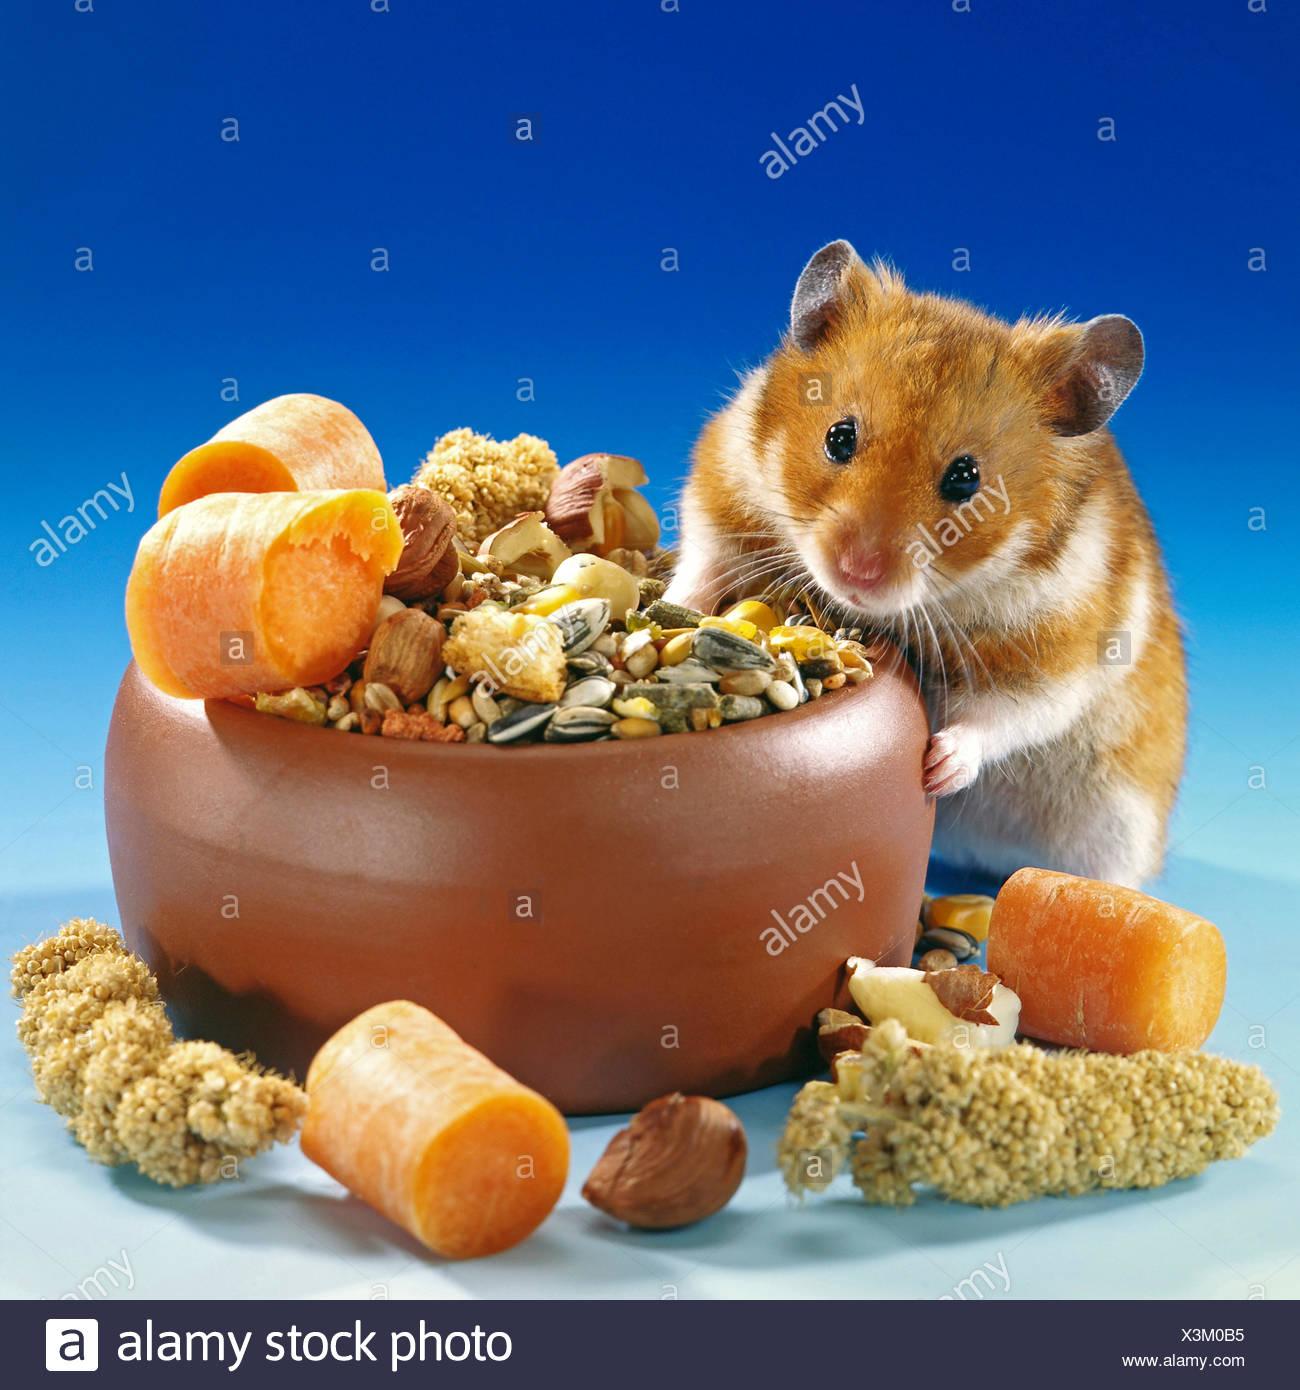 golden hamster (Mesocricetus auratus), at a feeding bowl